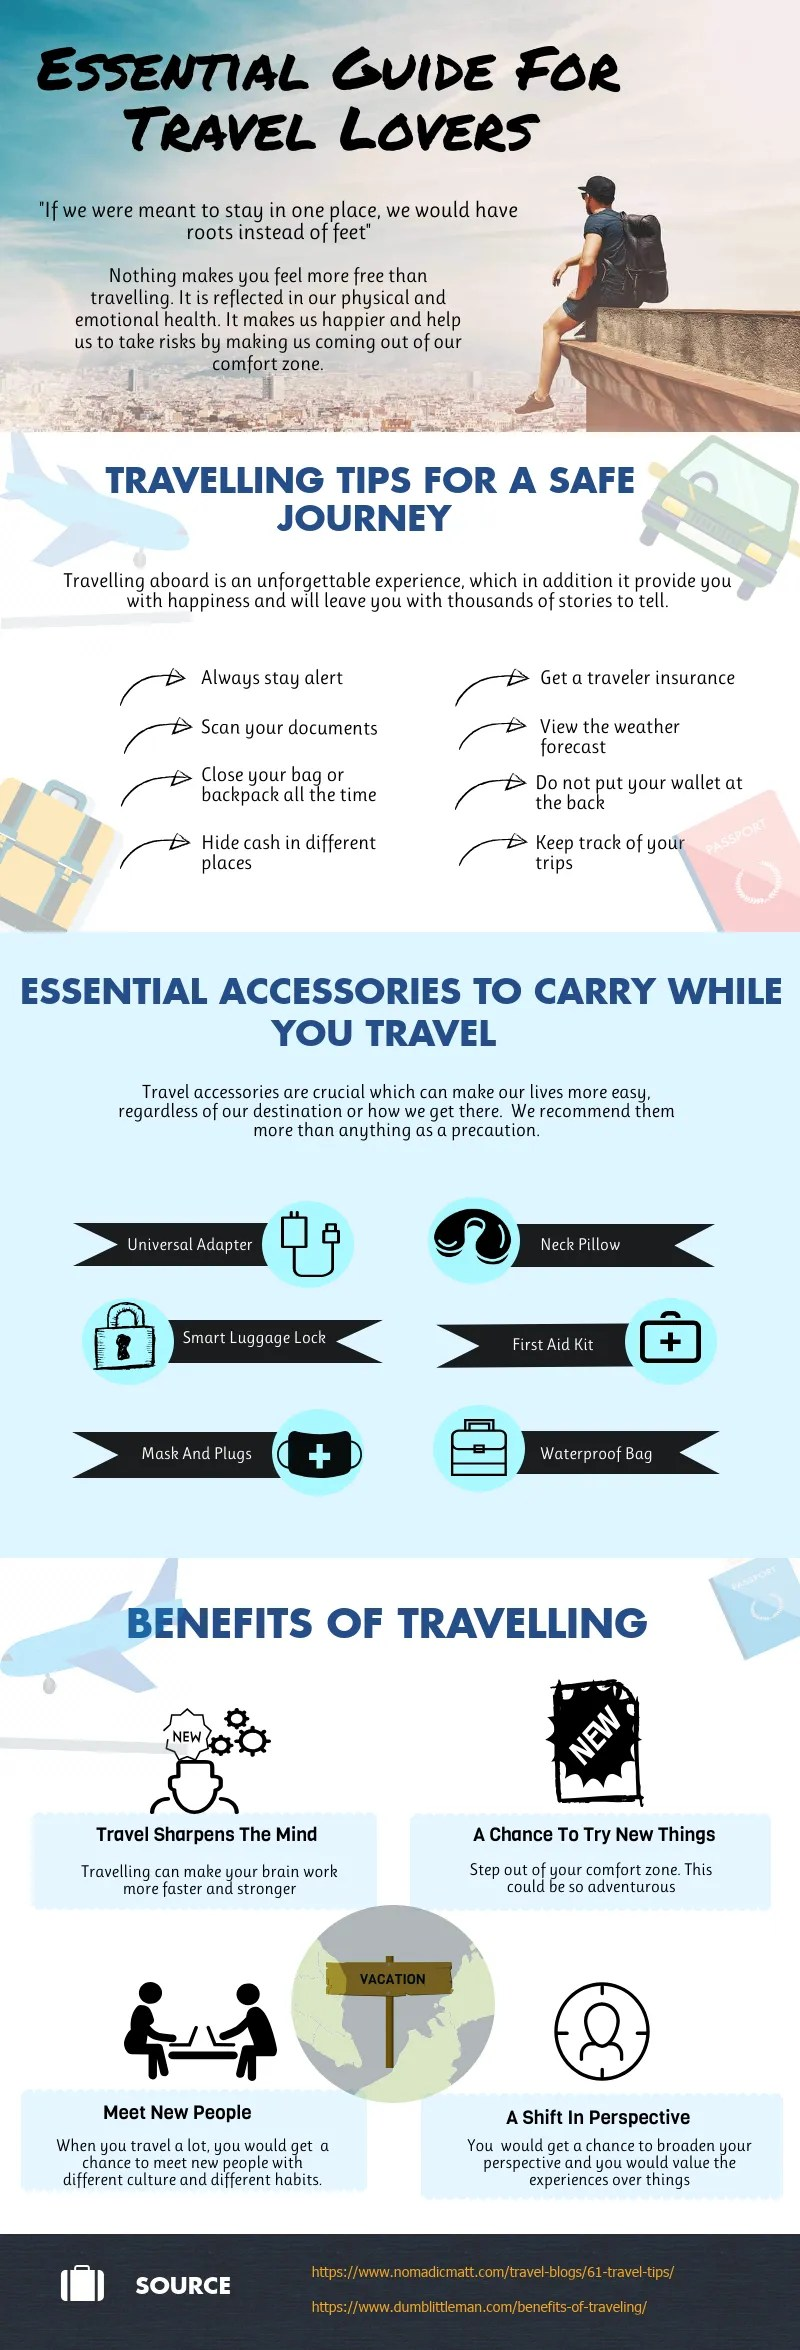 Travel and trek